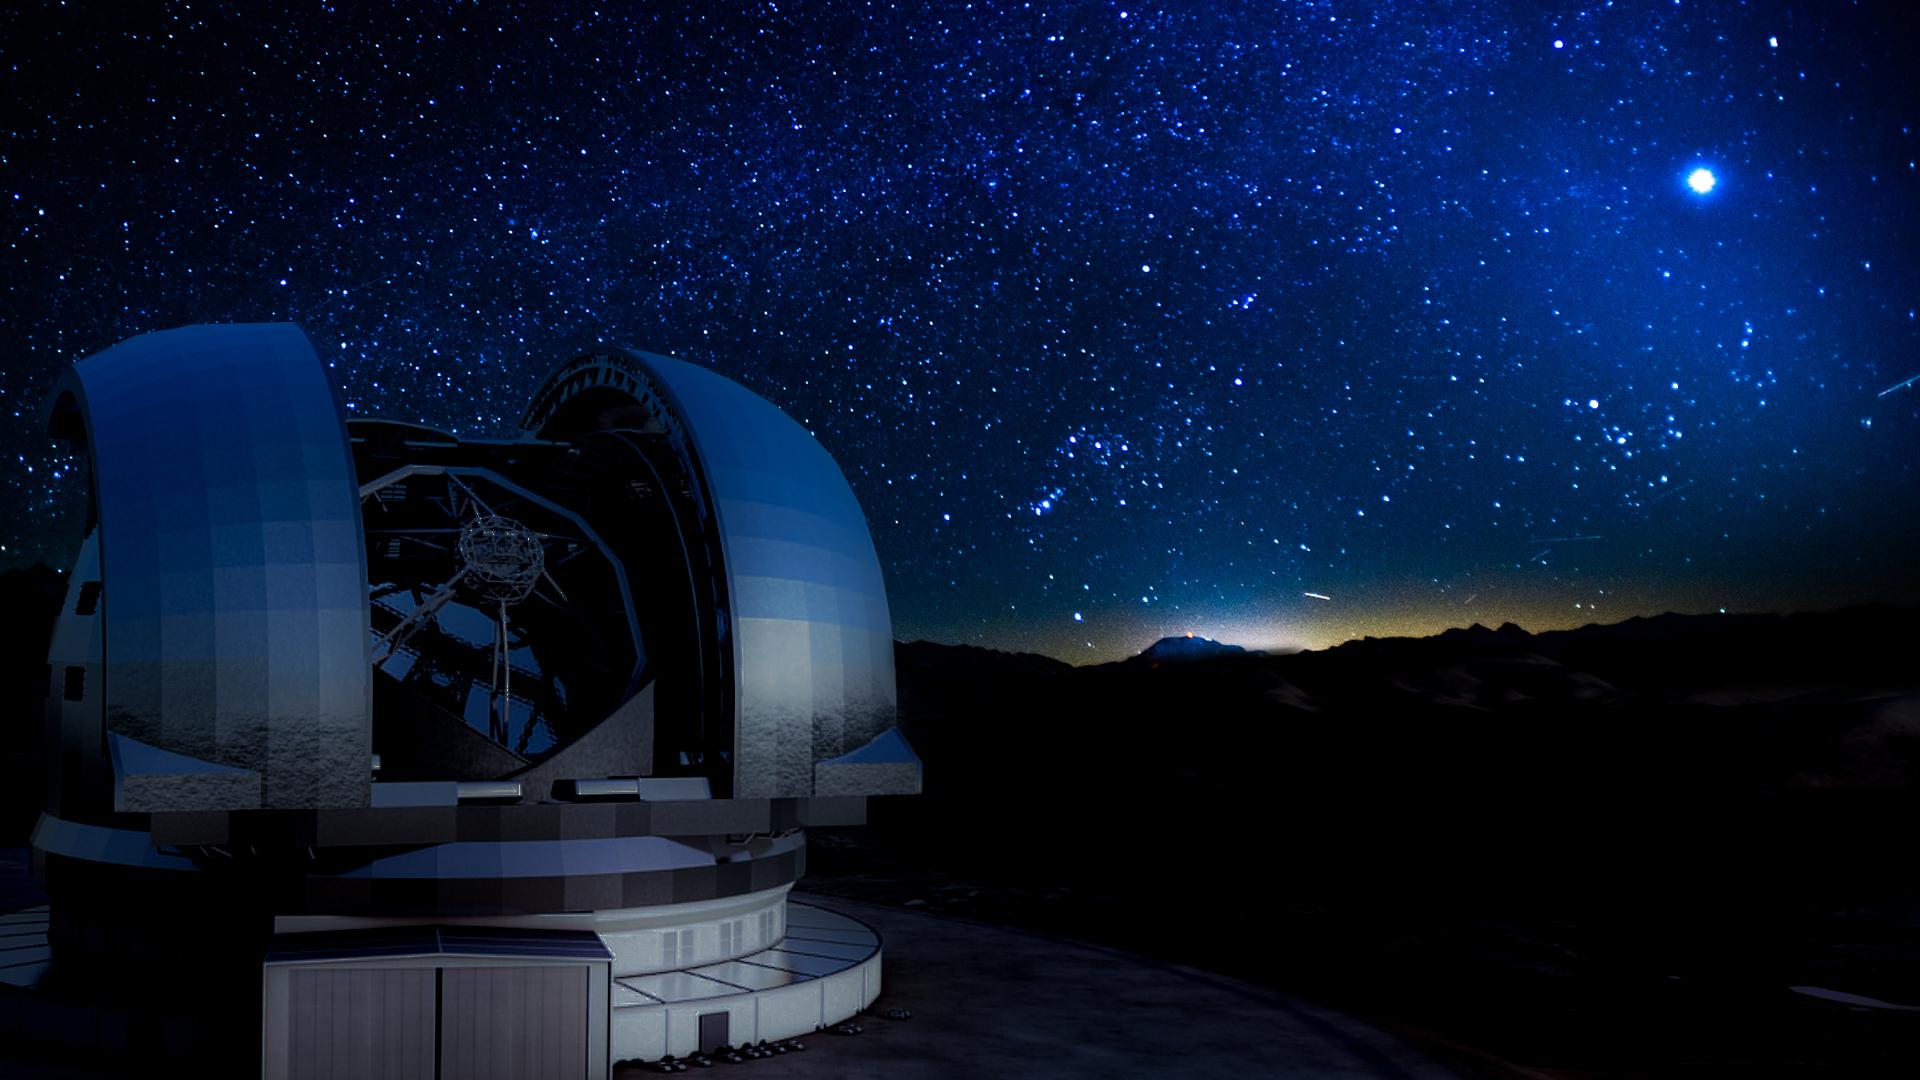 saul - ameliach - telescopio - óptico